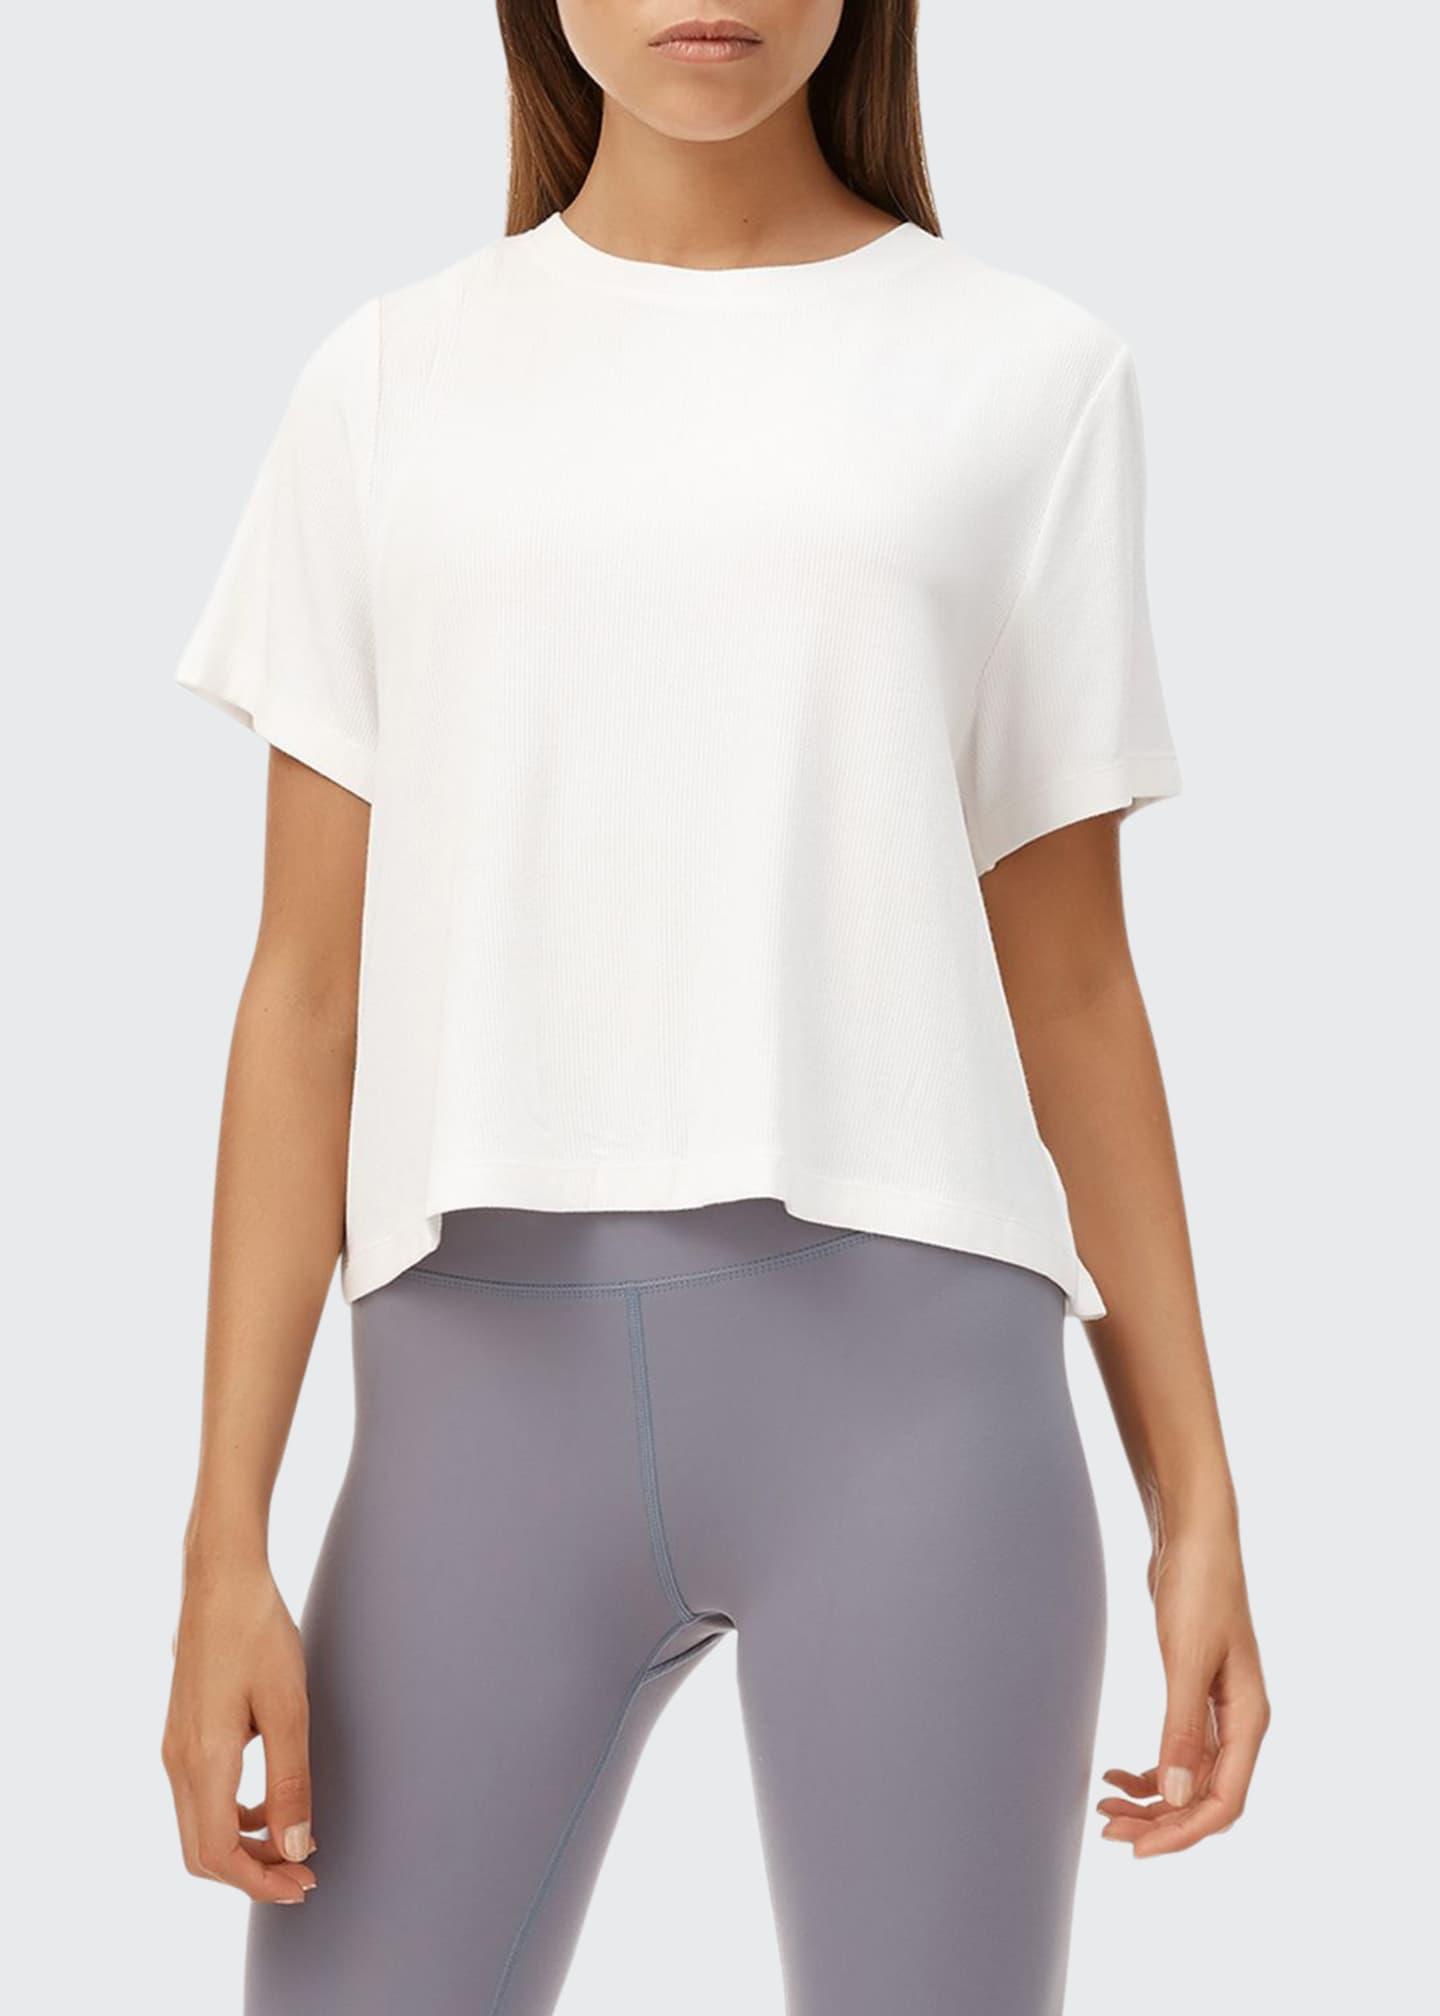 All Fenix Looper Short-Sleeve Lace-Up Back Tee